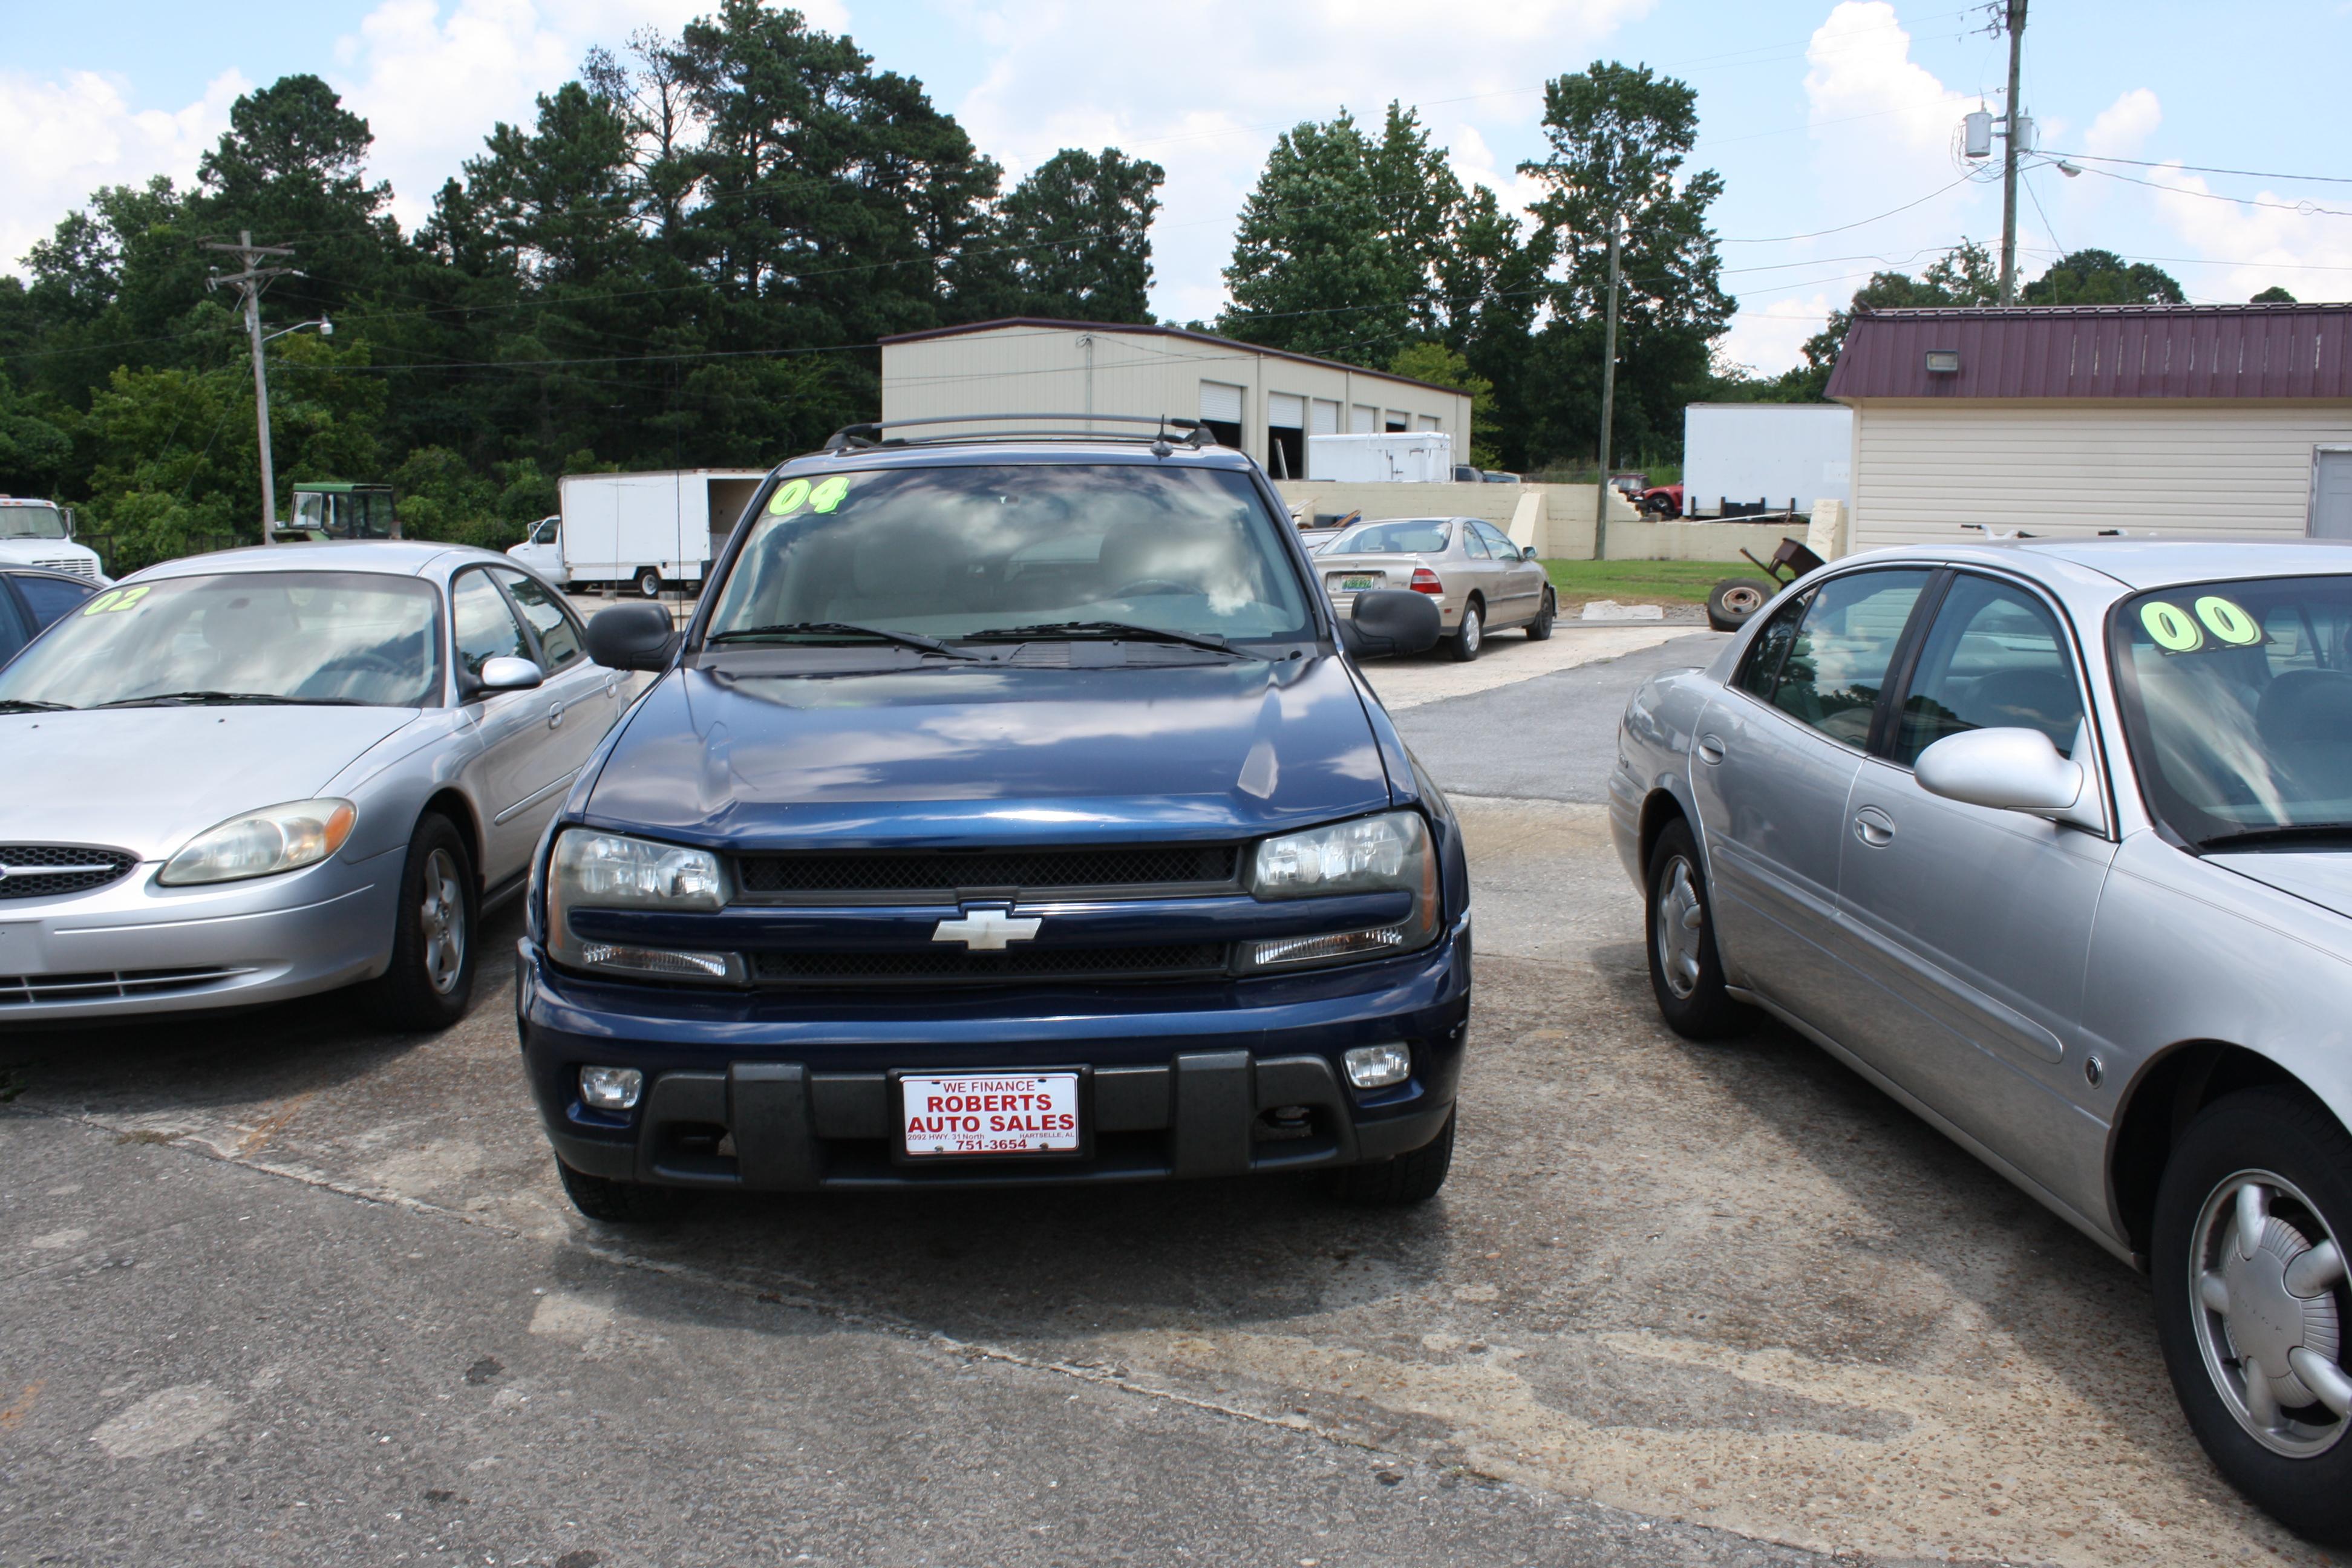 Roberts Auto Sales image 5